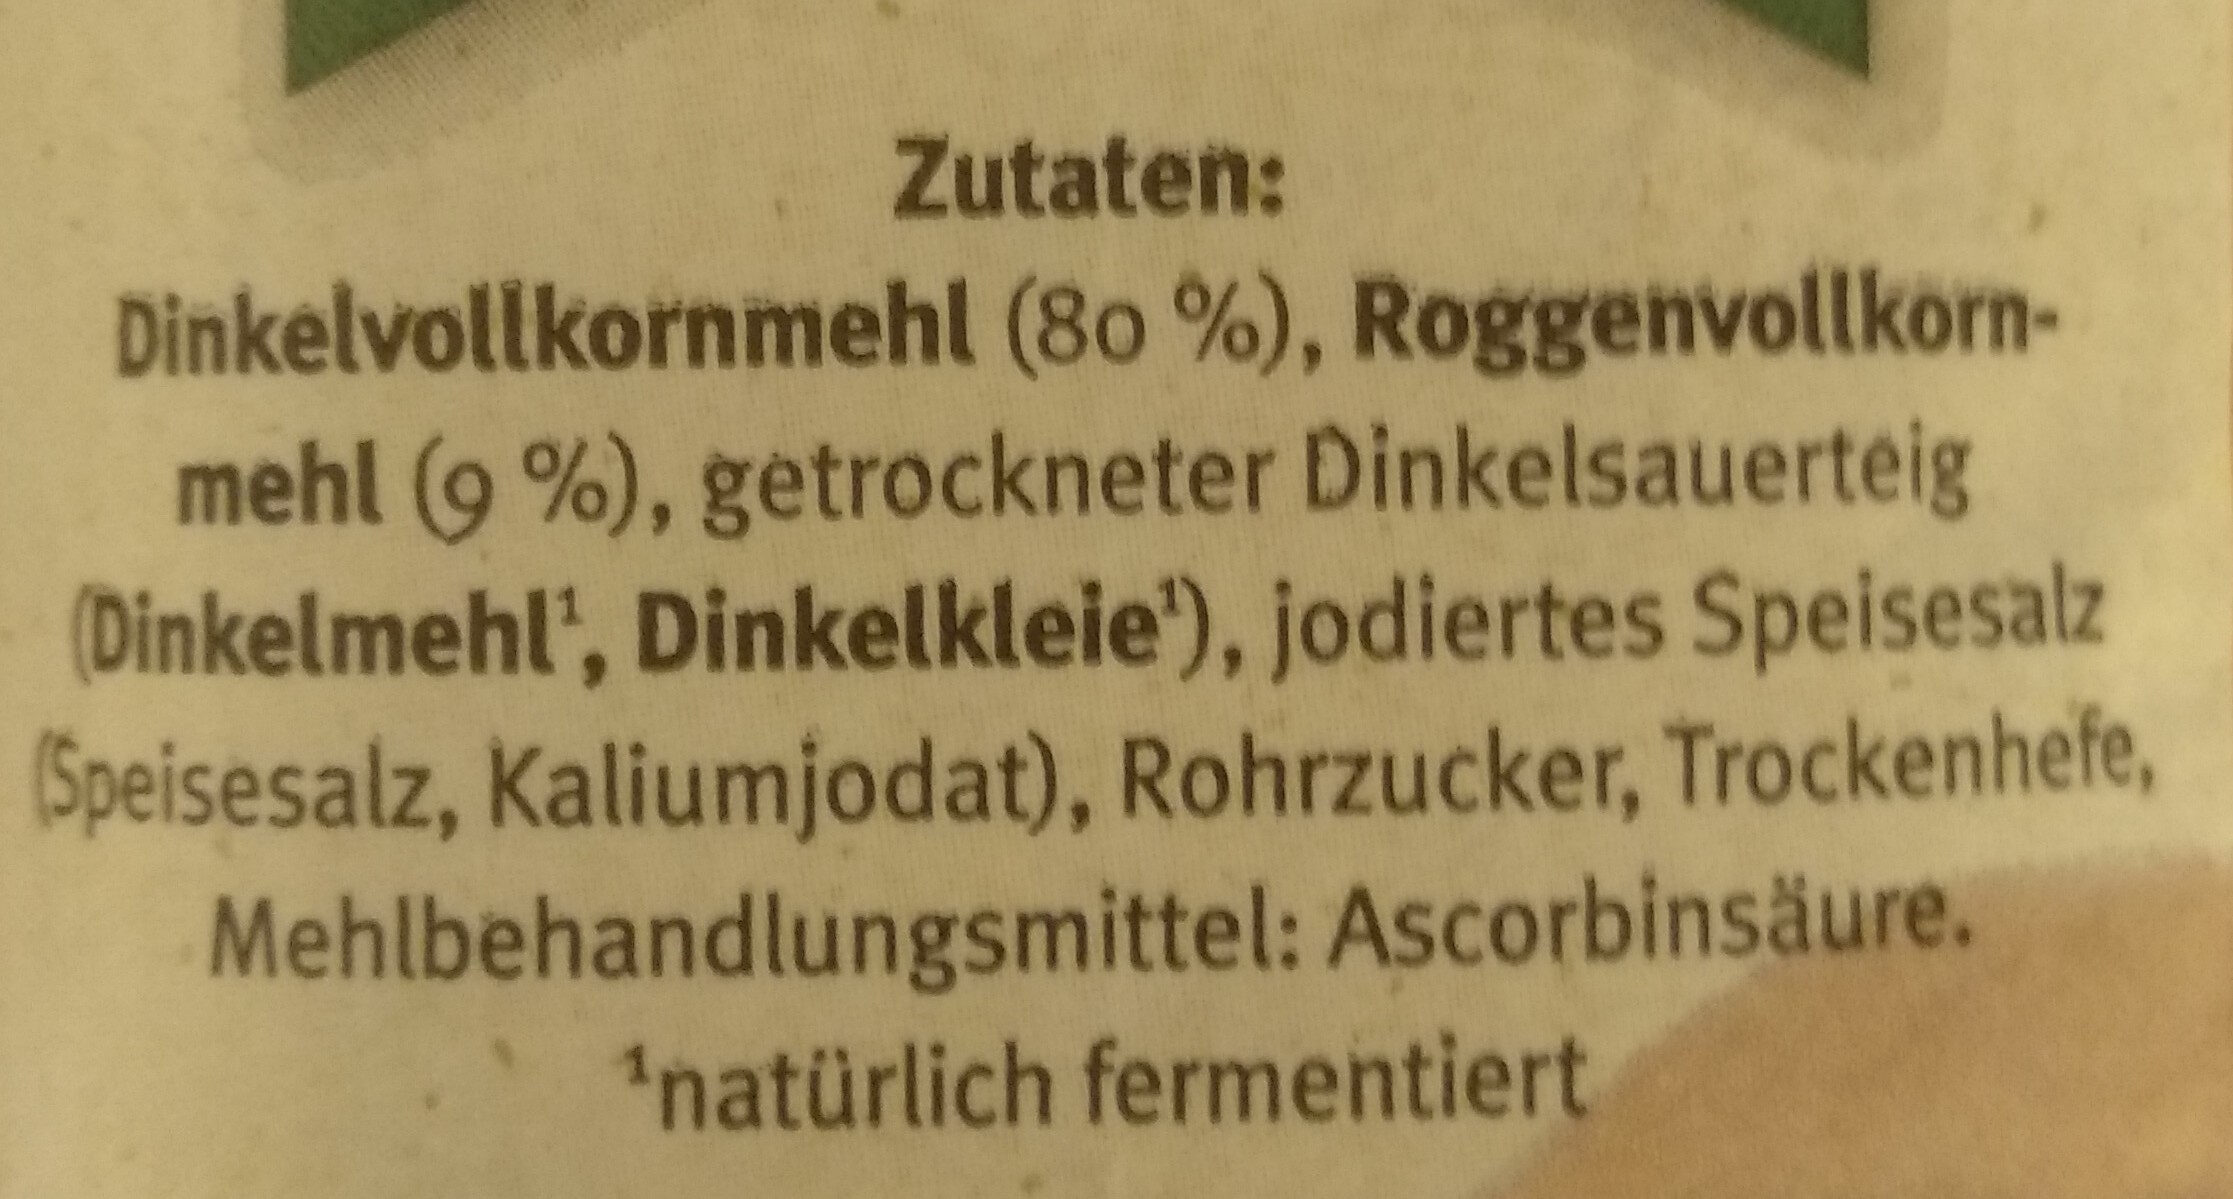 Dinkelvollkornbrot - Ingredients